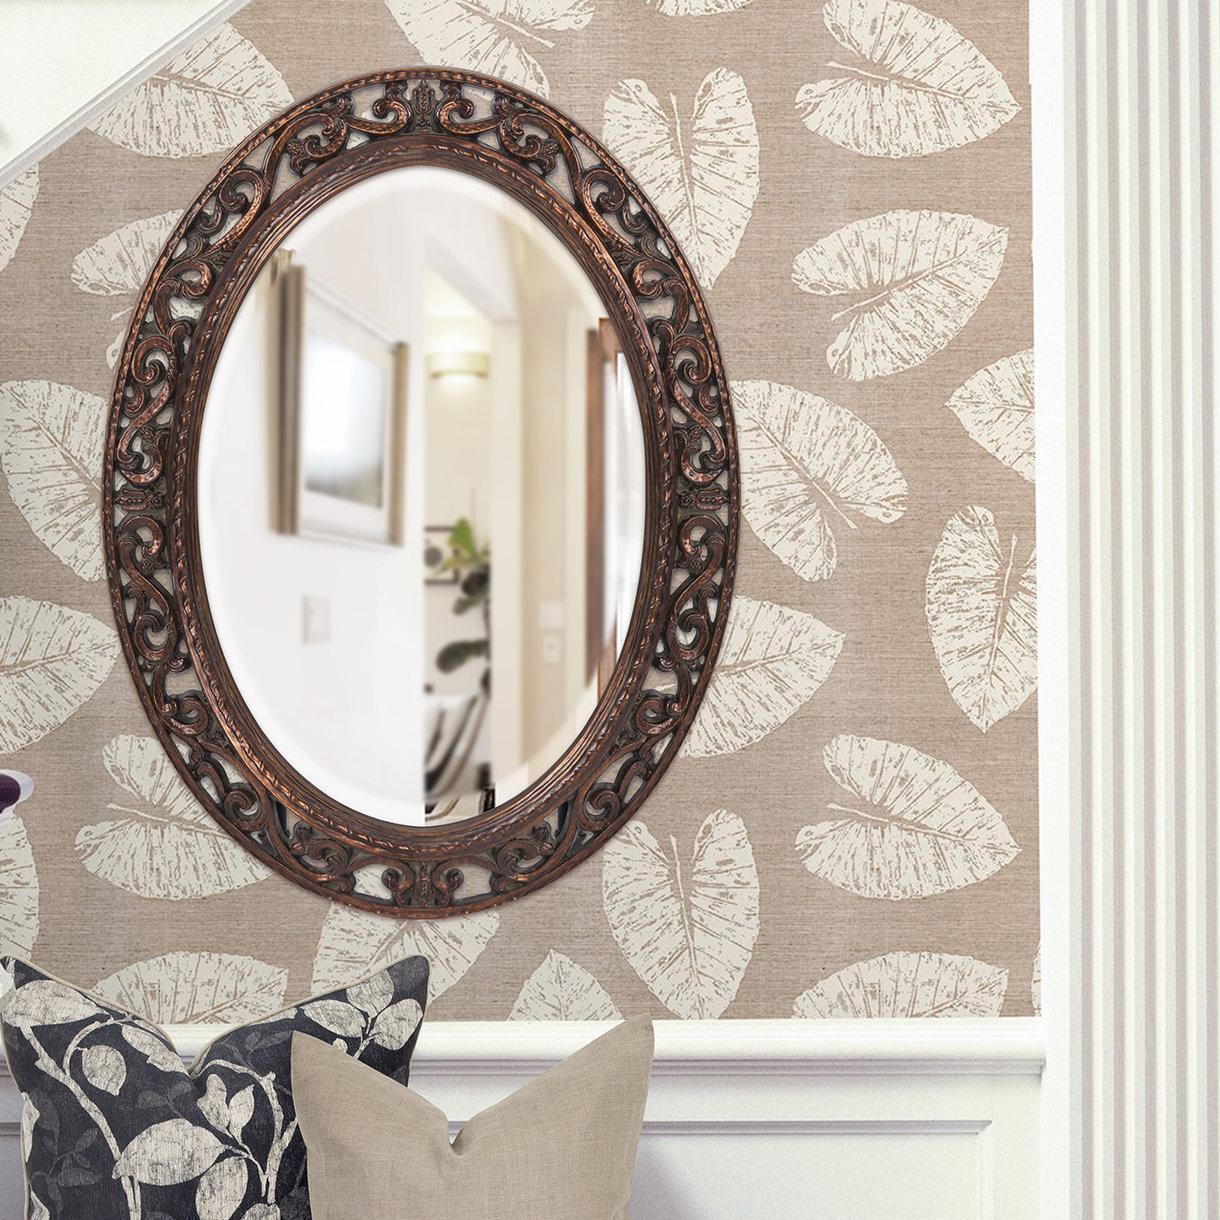 Antique Bronze Accent Mirror | Wayfair In Brynn Accent Mirrors (View 21 of 30)